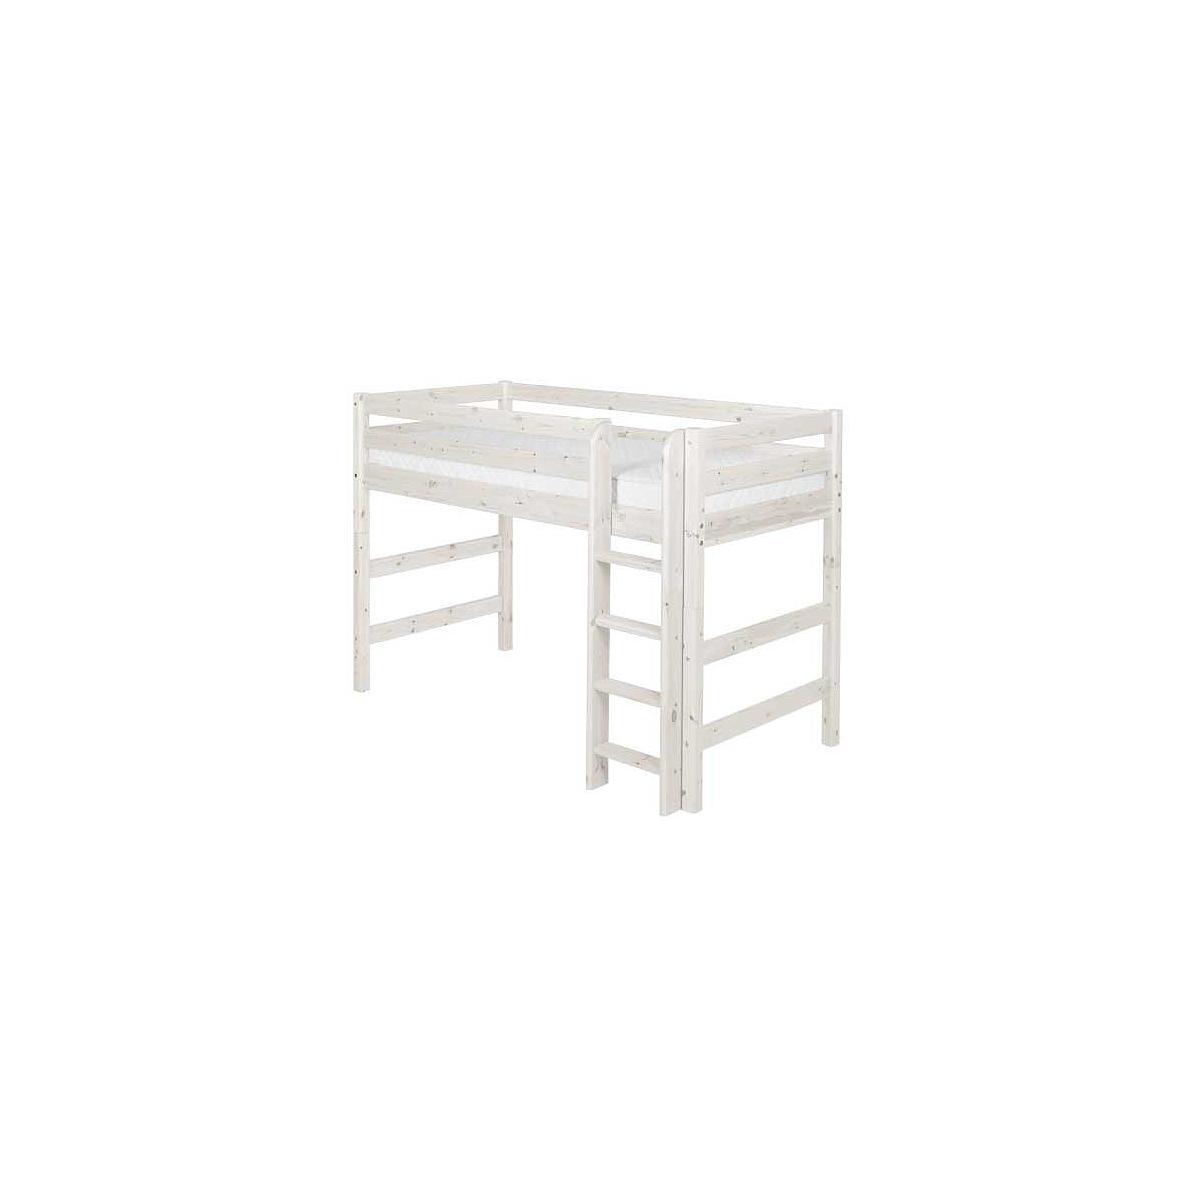 Cama semi alta 90x190 CLASSIC Flexa escalera recta blanco cal